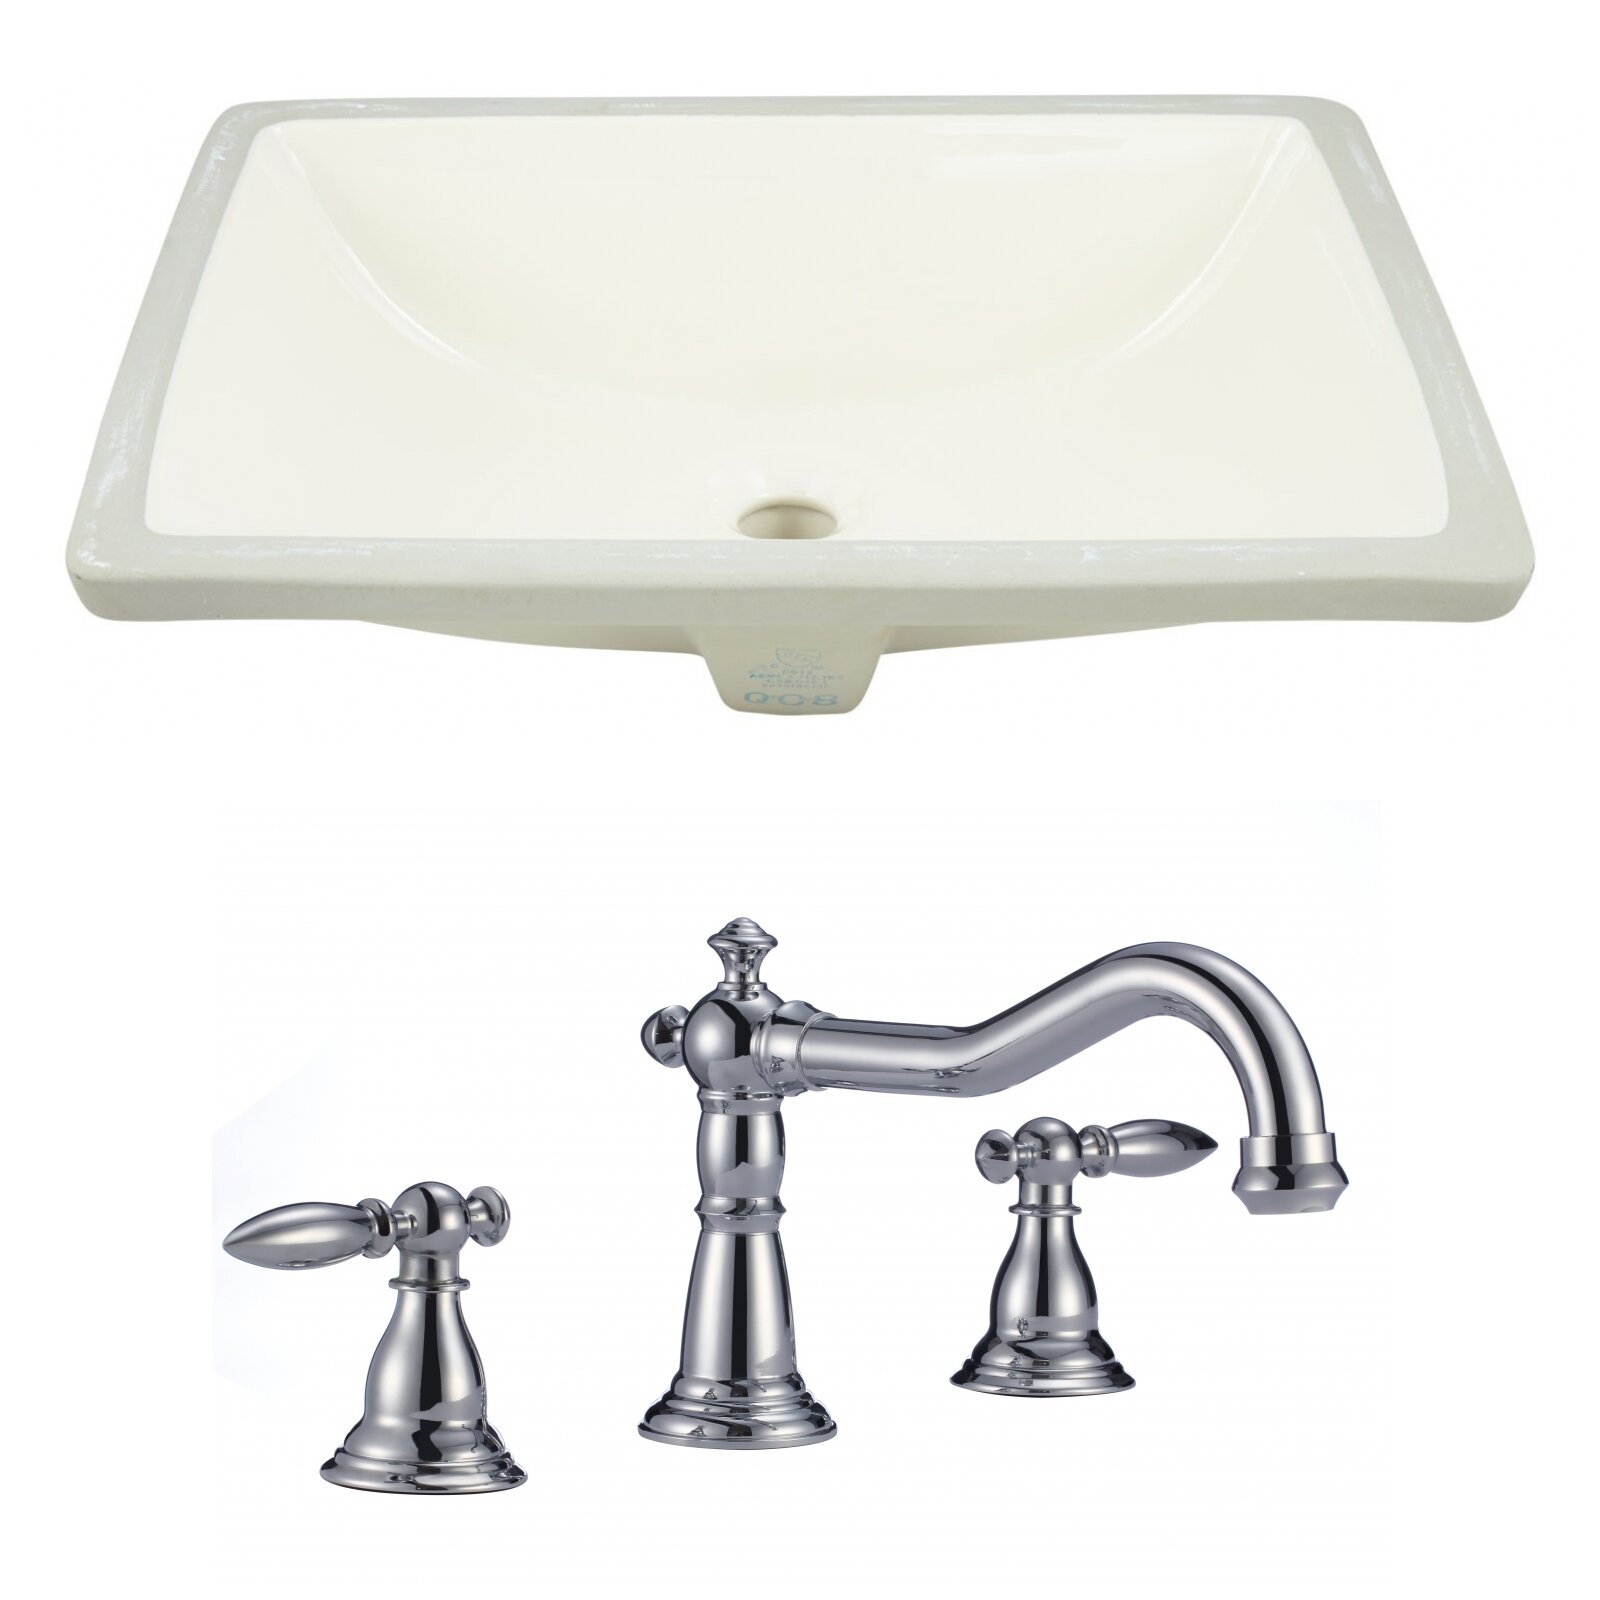 American Imaginations Cupc Ceramic Rectangular Undermount Bathroom Sink With Faucet And Overflow Wayfair